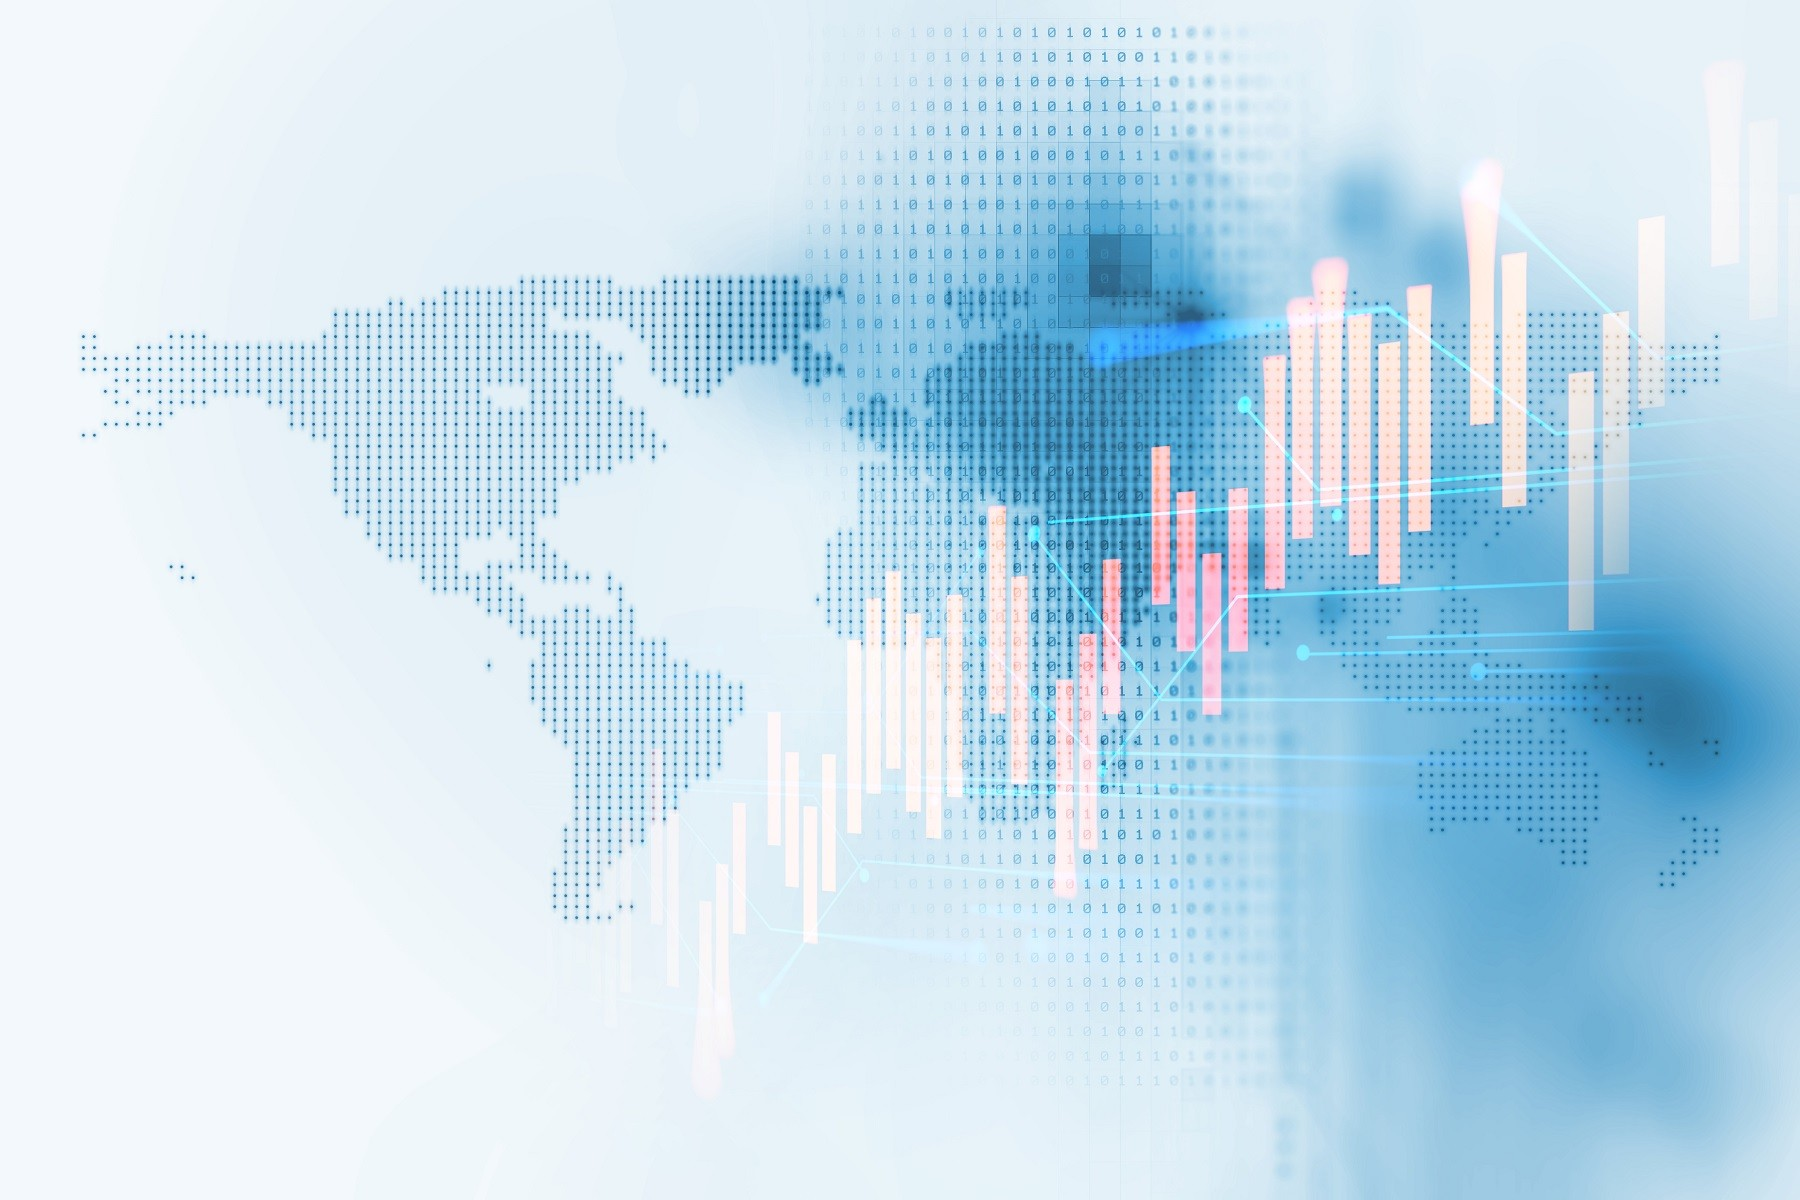 Gemalto advances secure communications for Financial Services industry TechNative